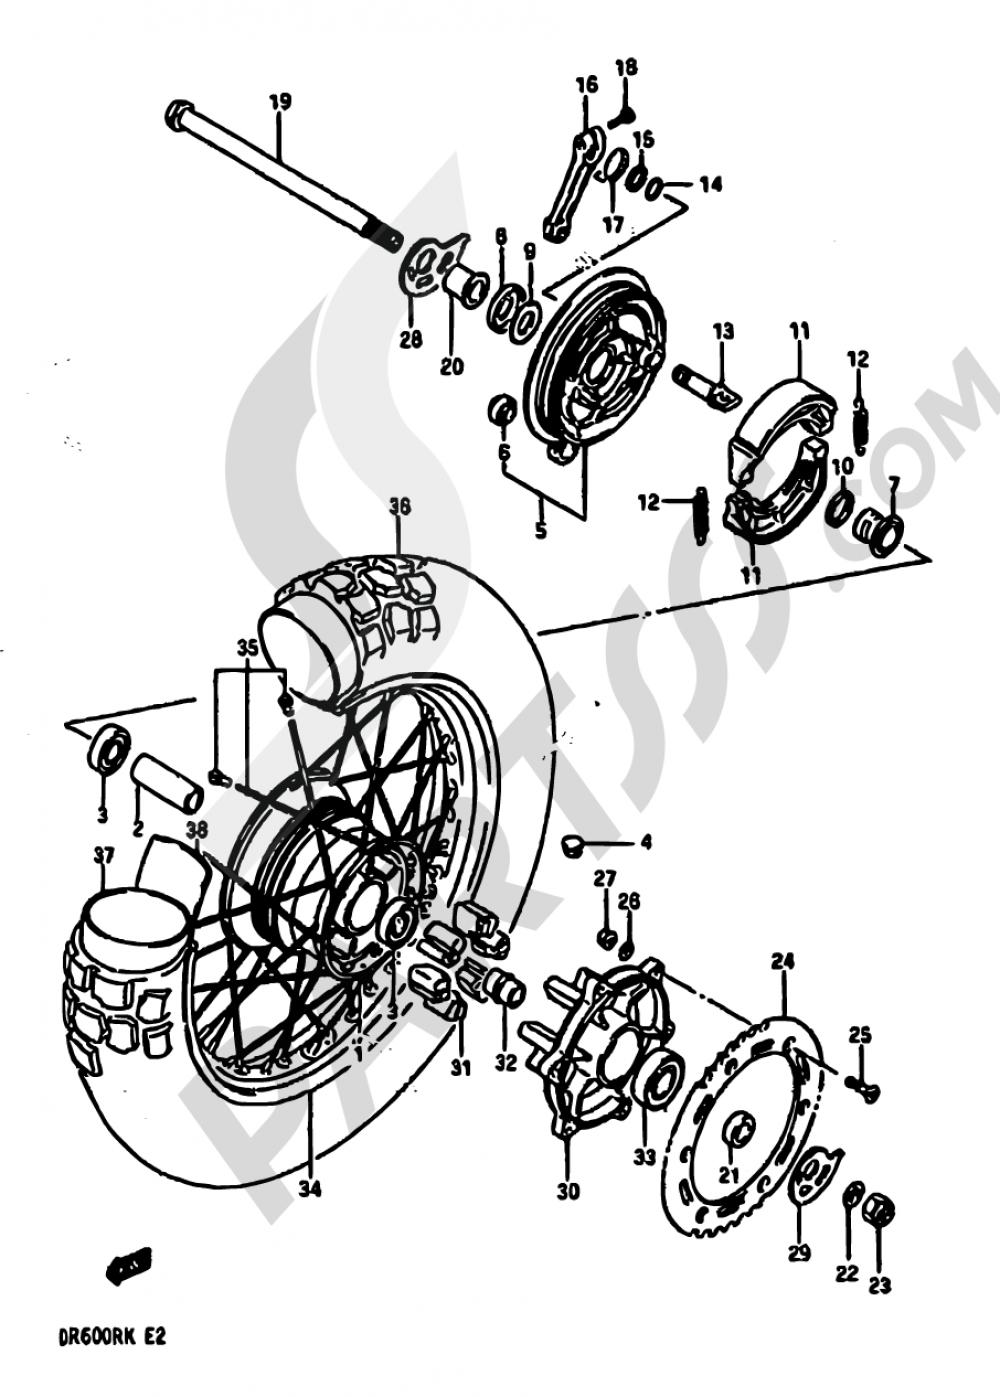 59 - REAR WHEEL (MODEL G/H/J) Suzuki DR600R 1988